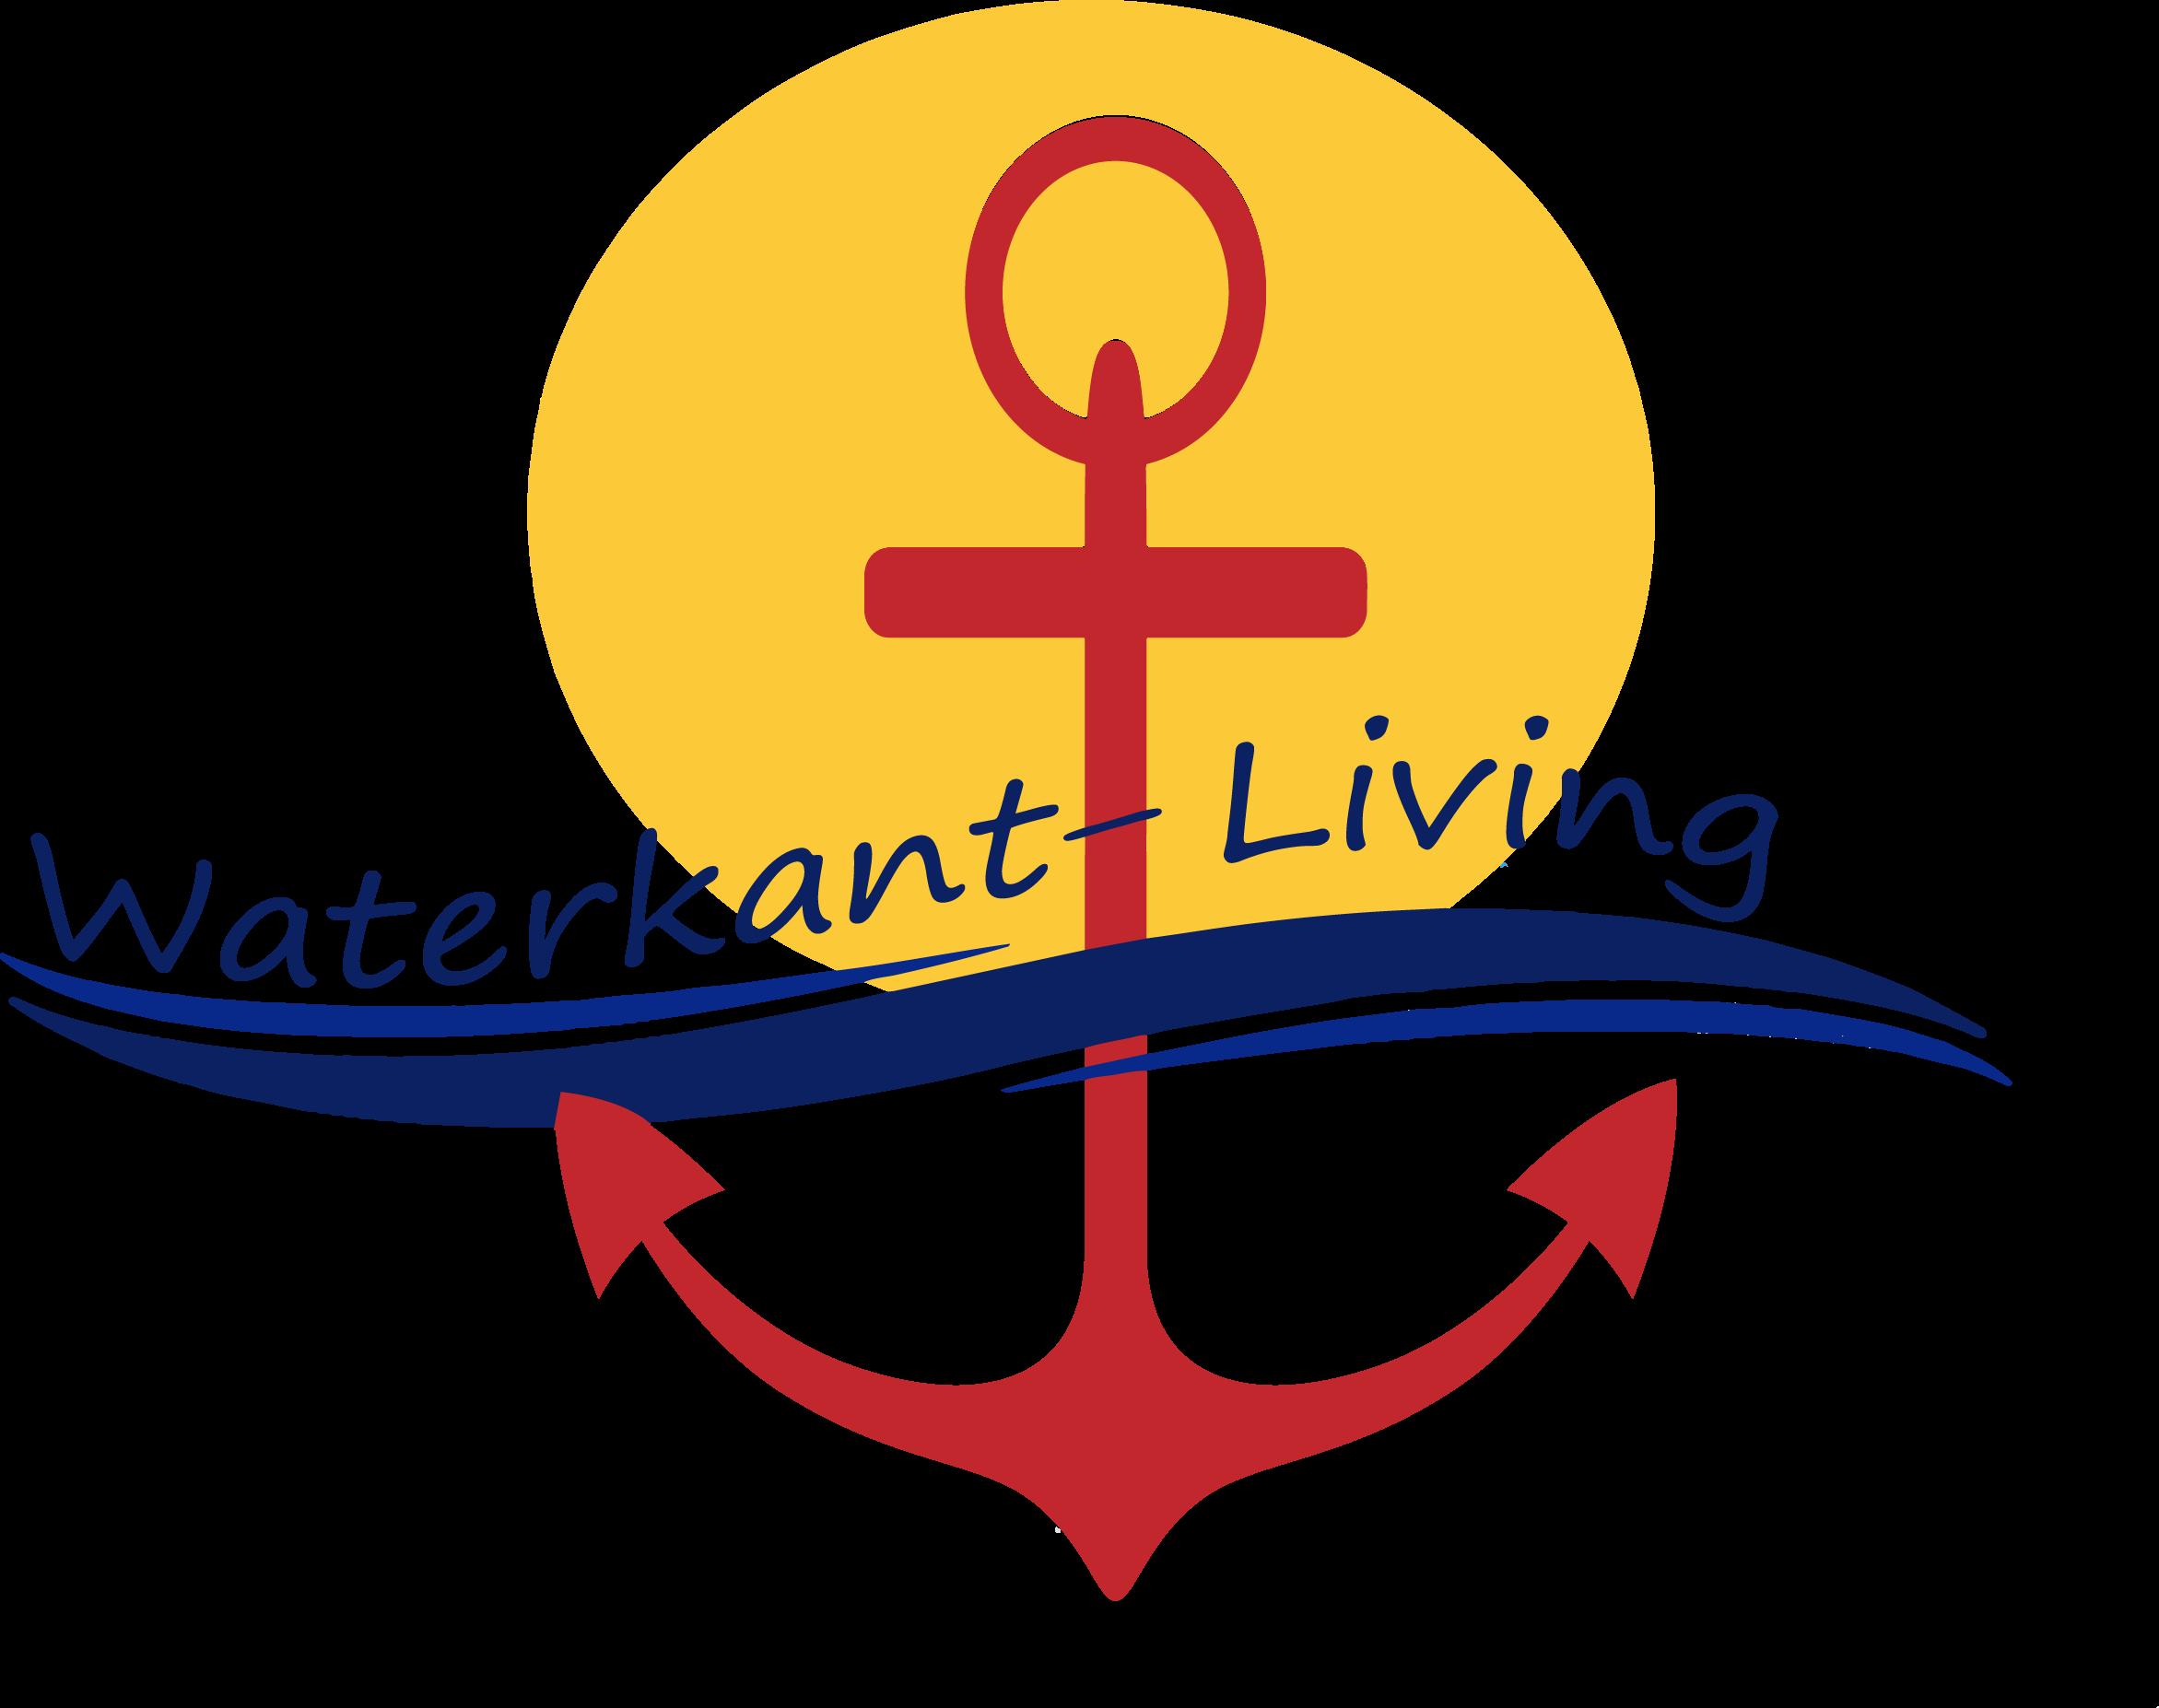 waterkant-living Logo